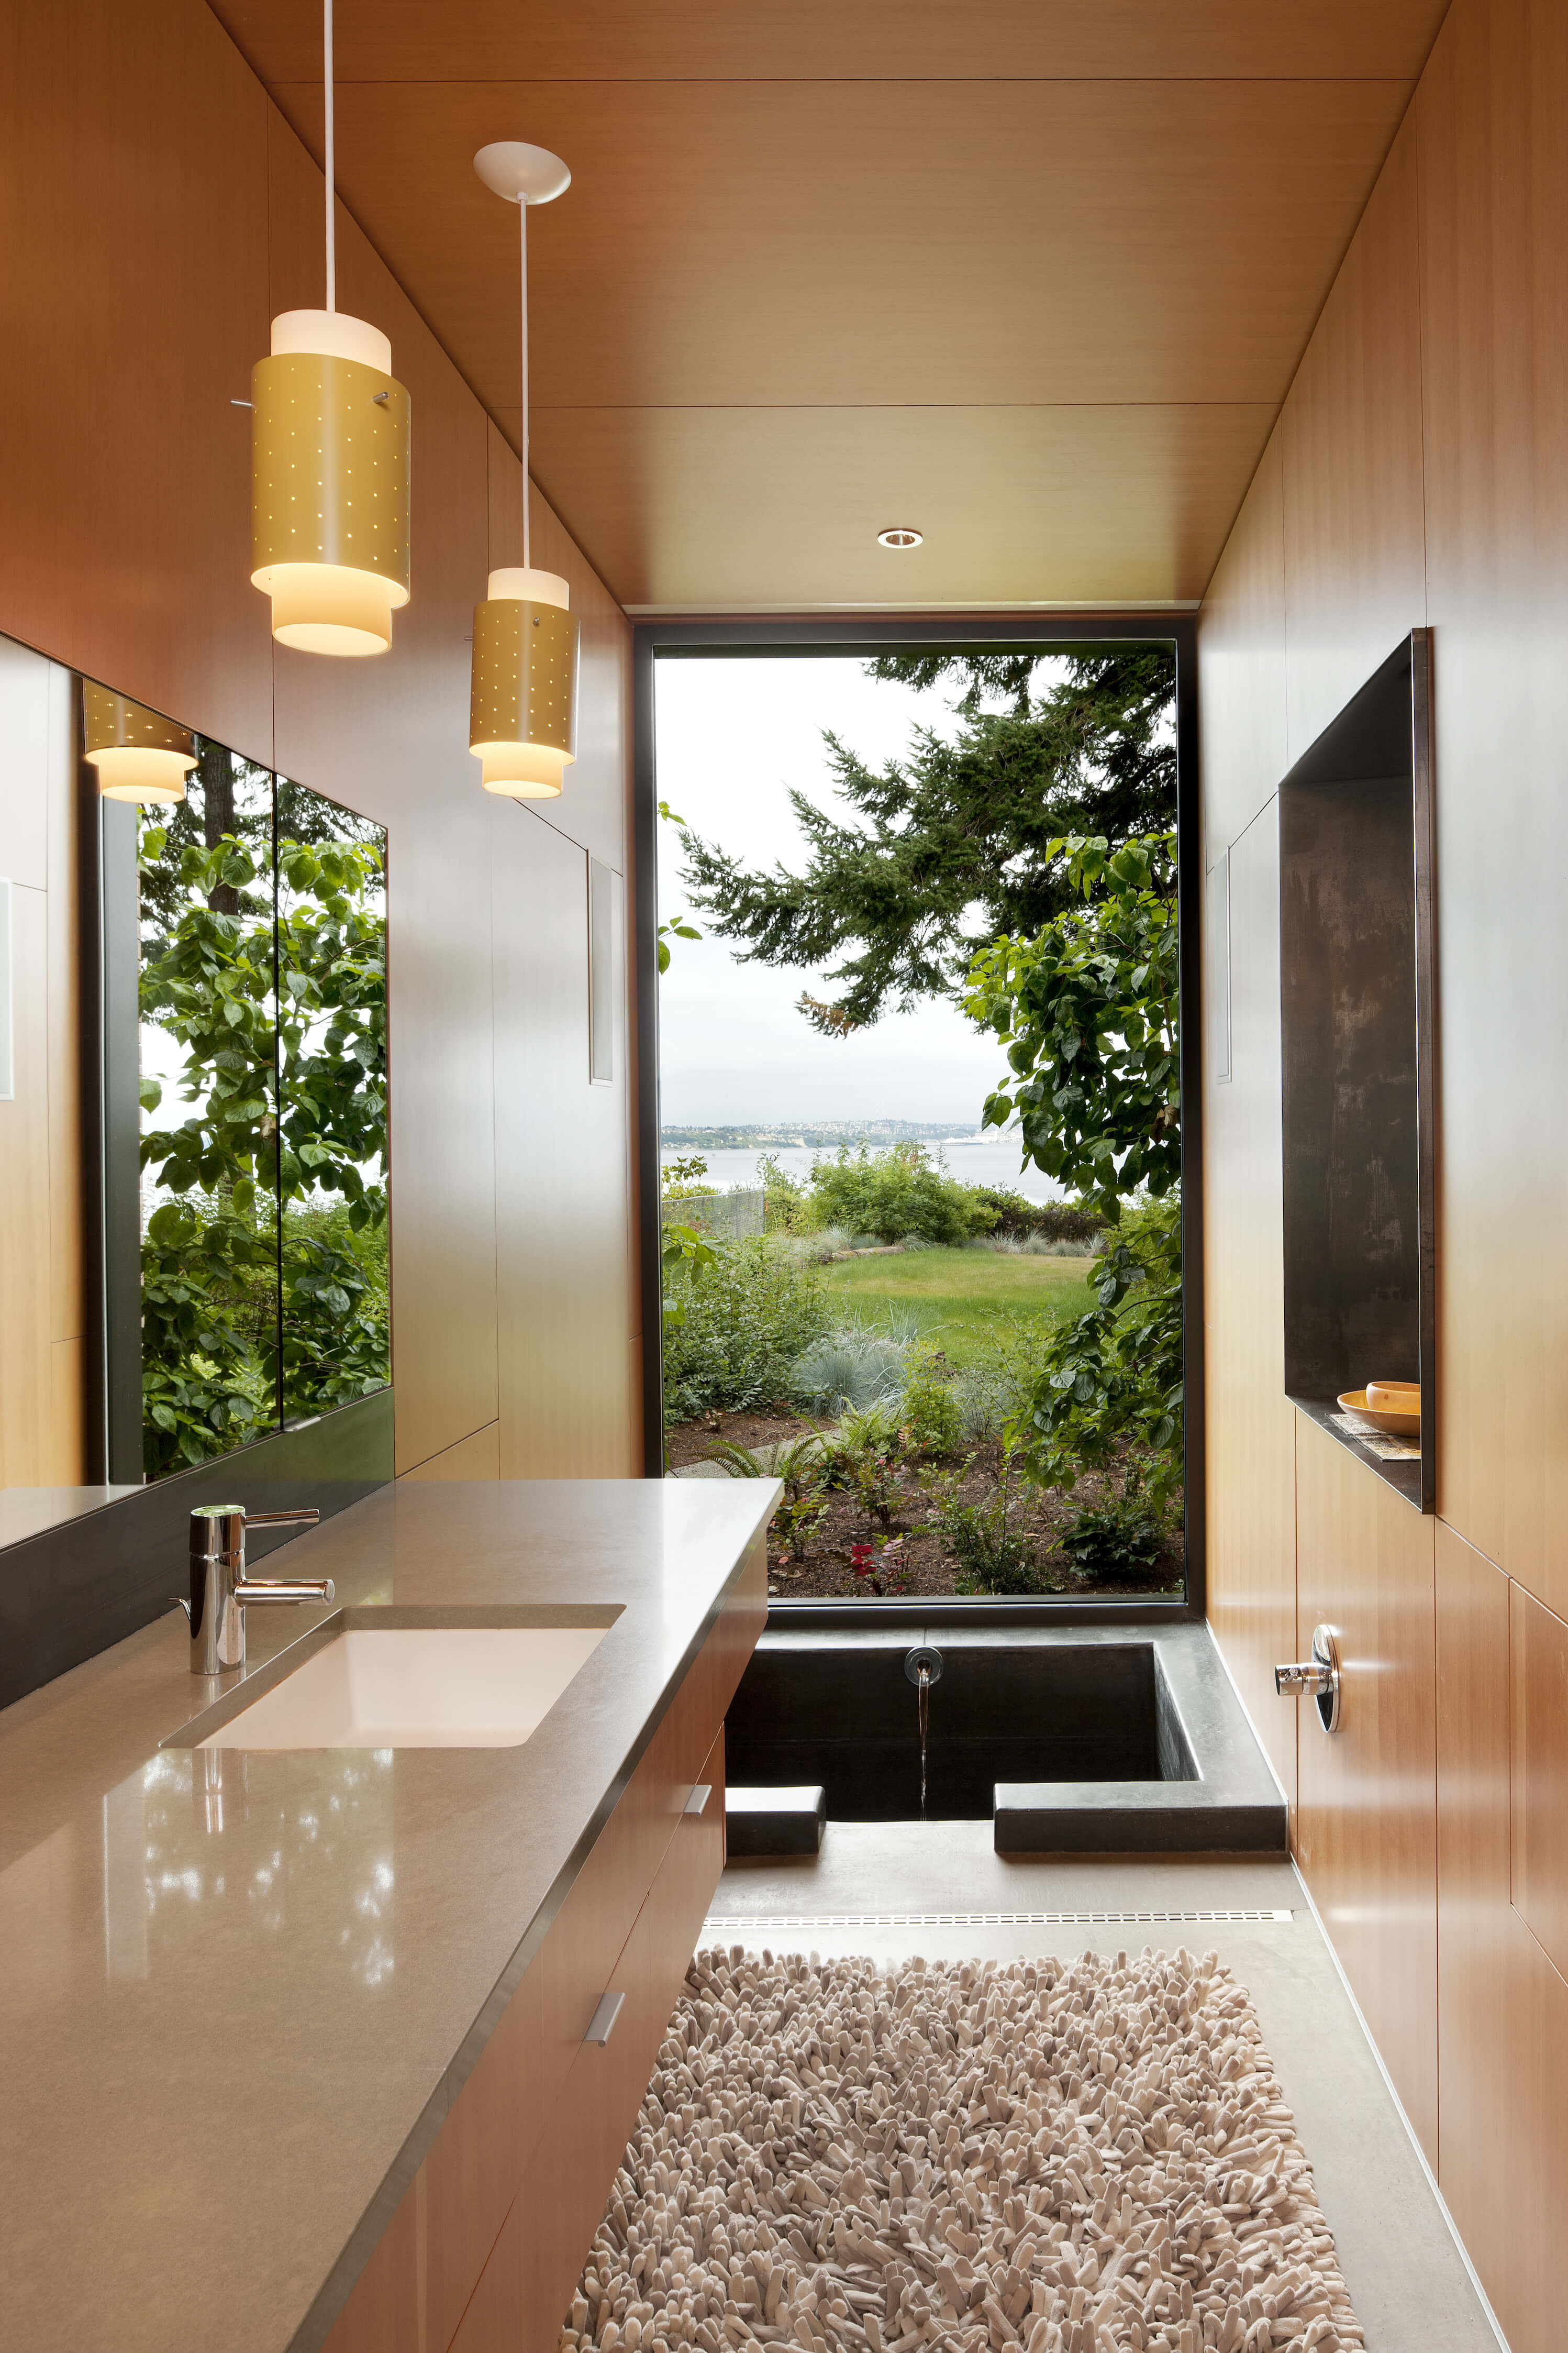 3 stunning modern home designs by coates design architects for Sunken bathtub